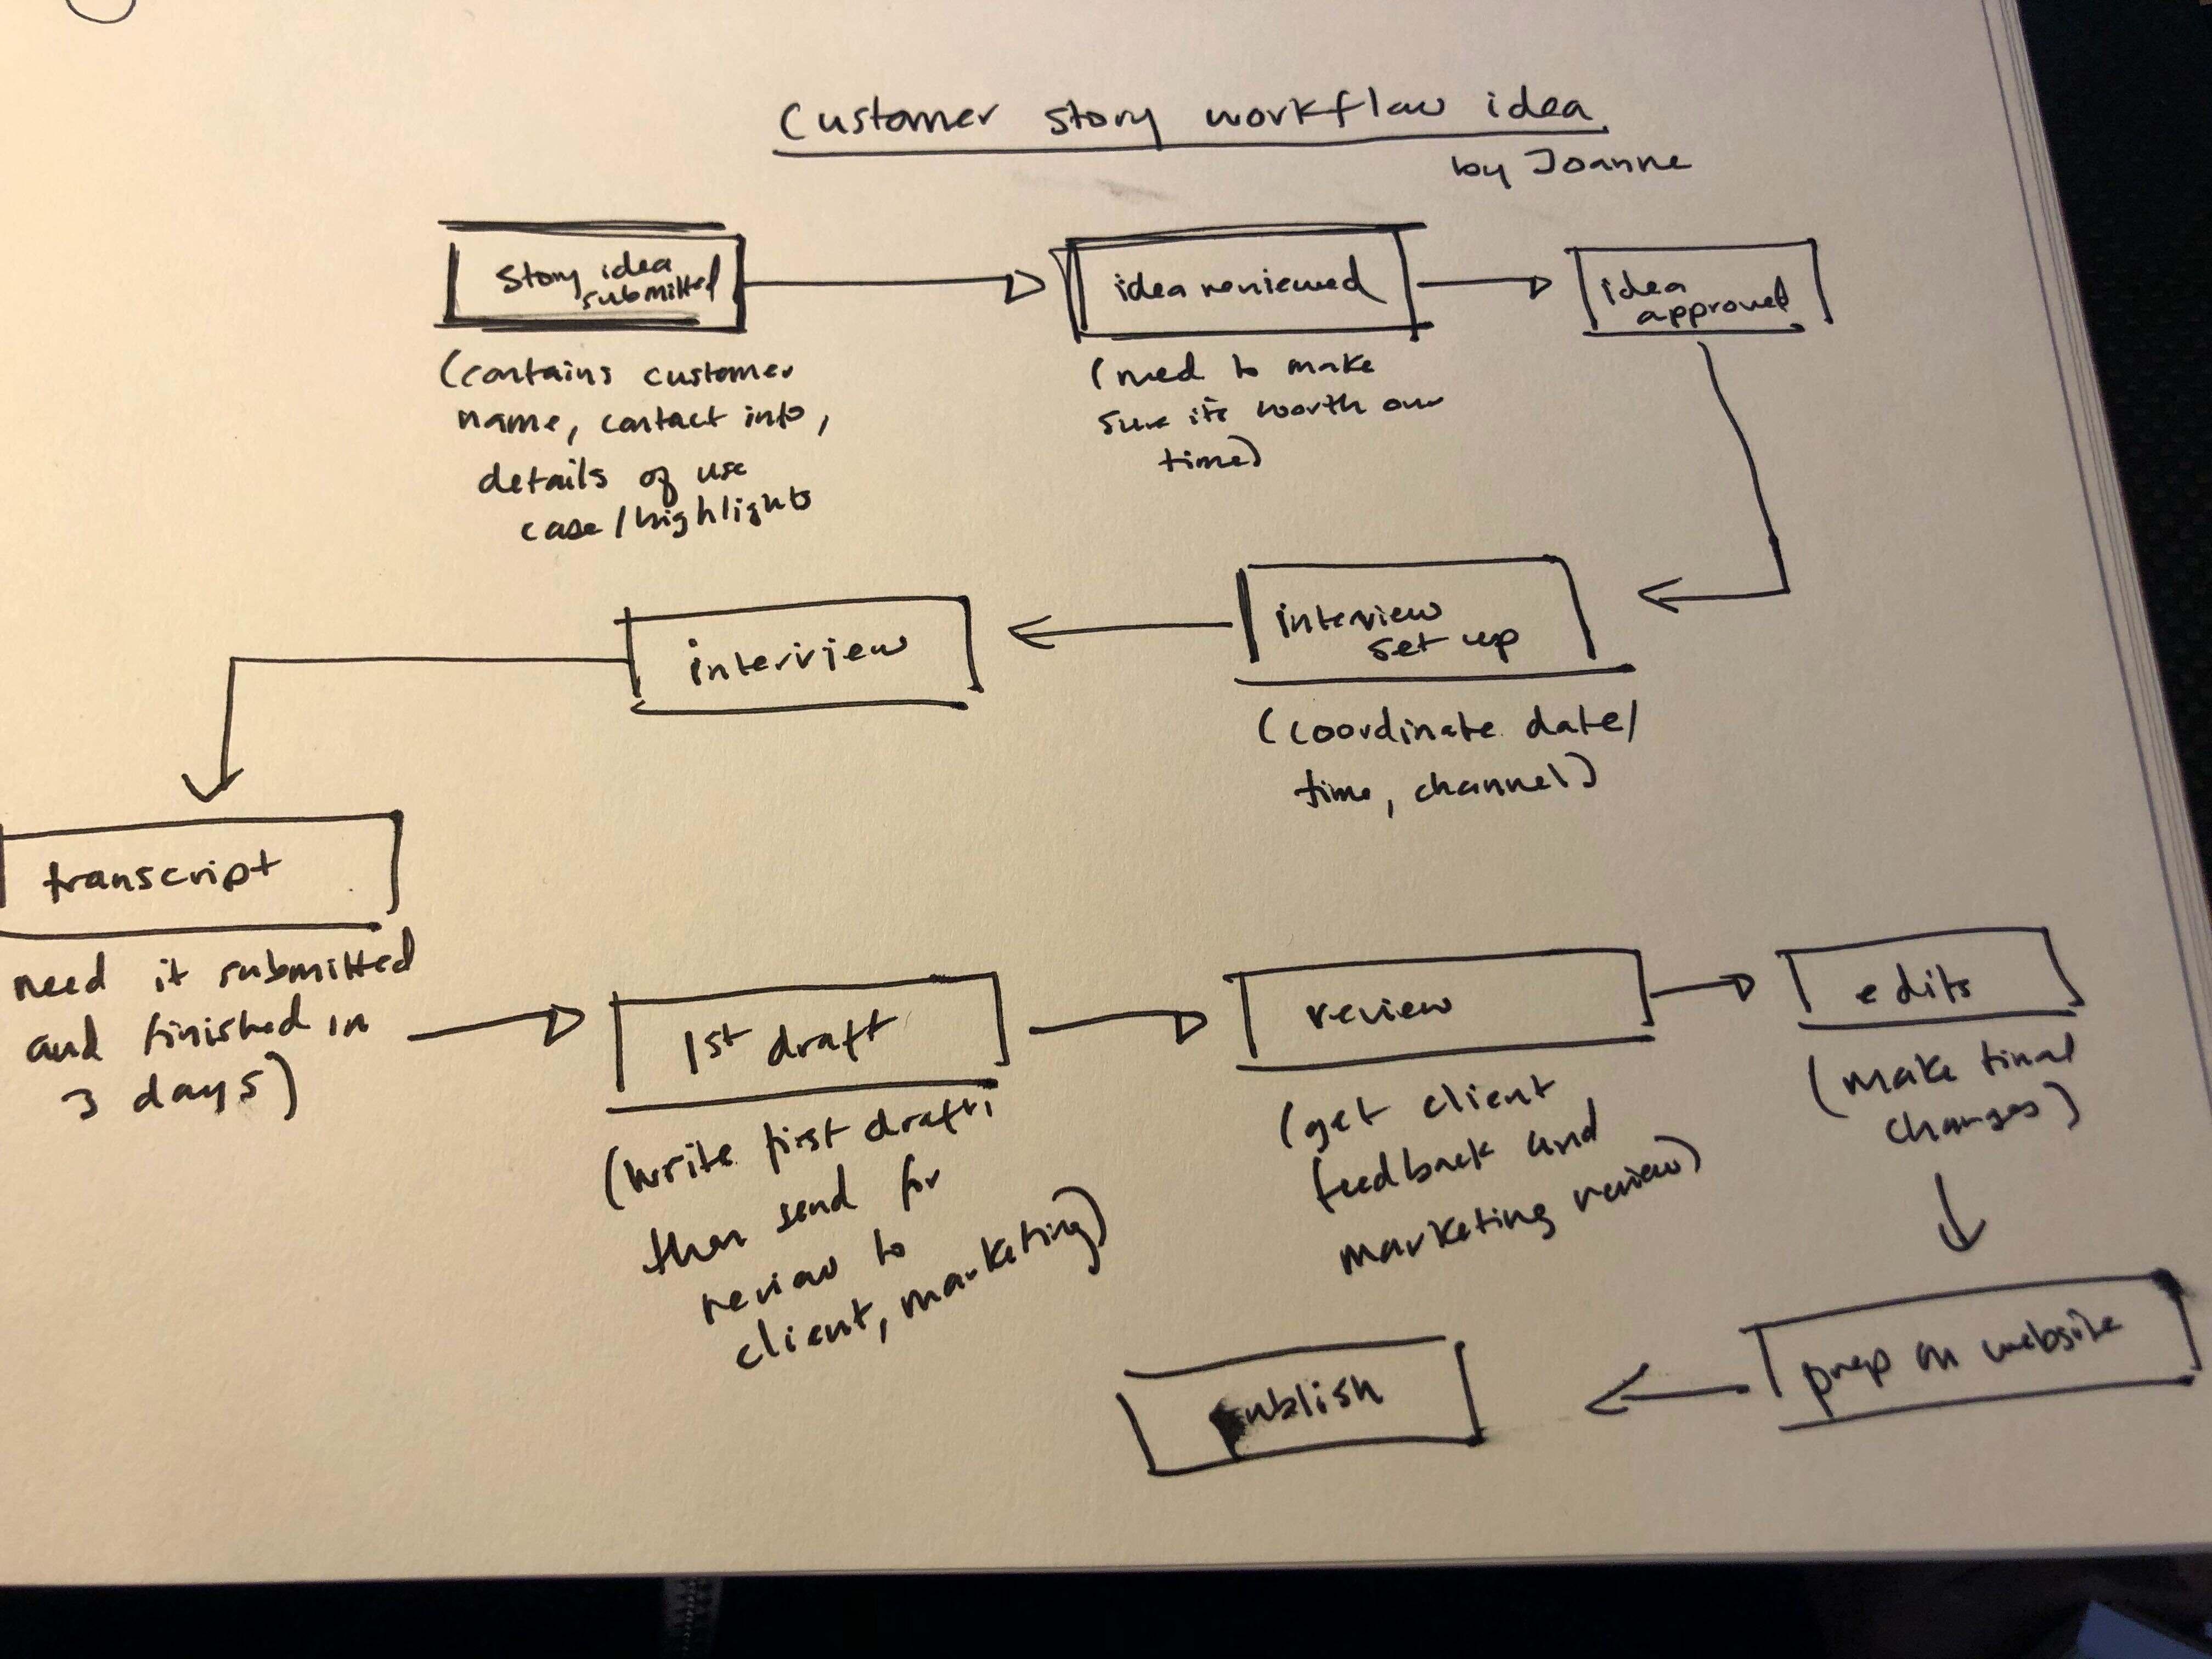 workflow_sketchedout_kintone